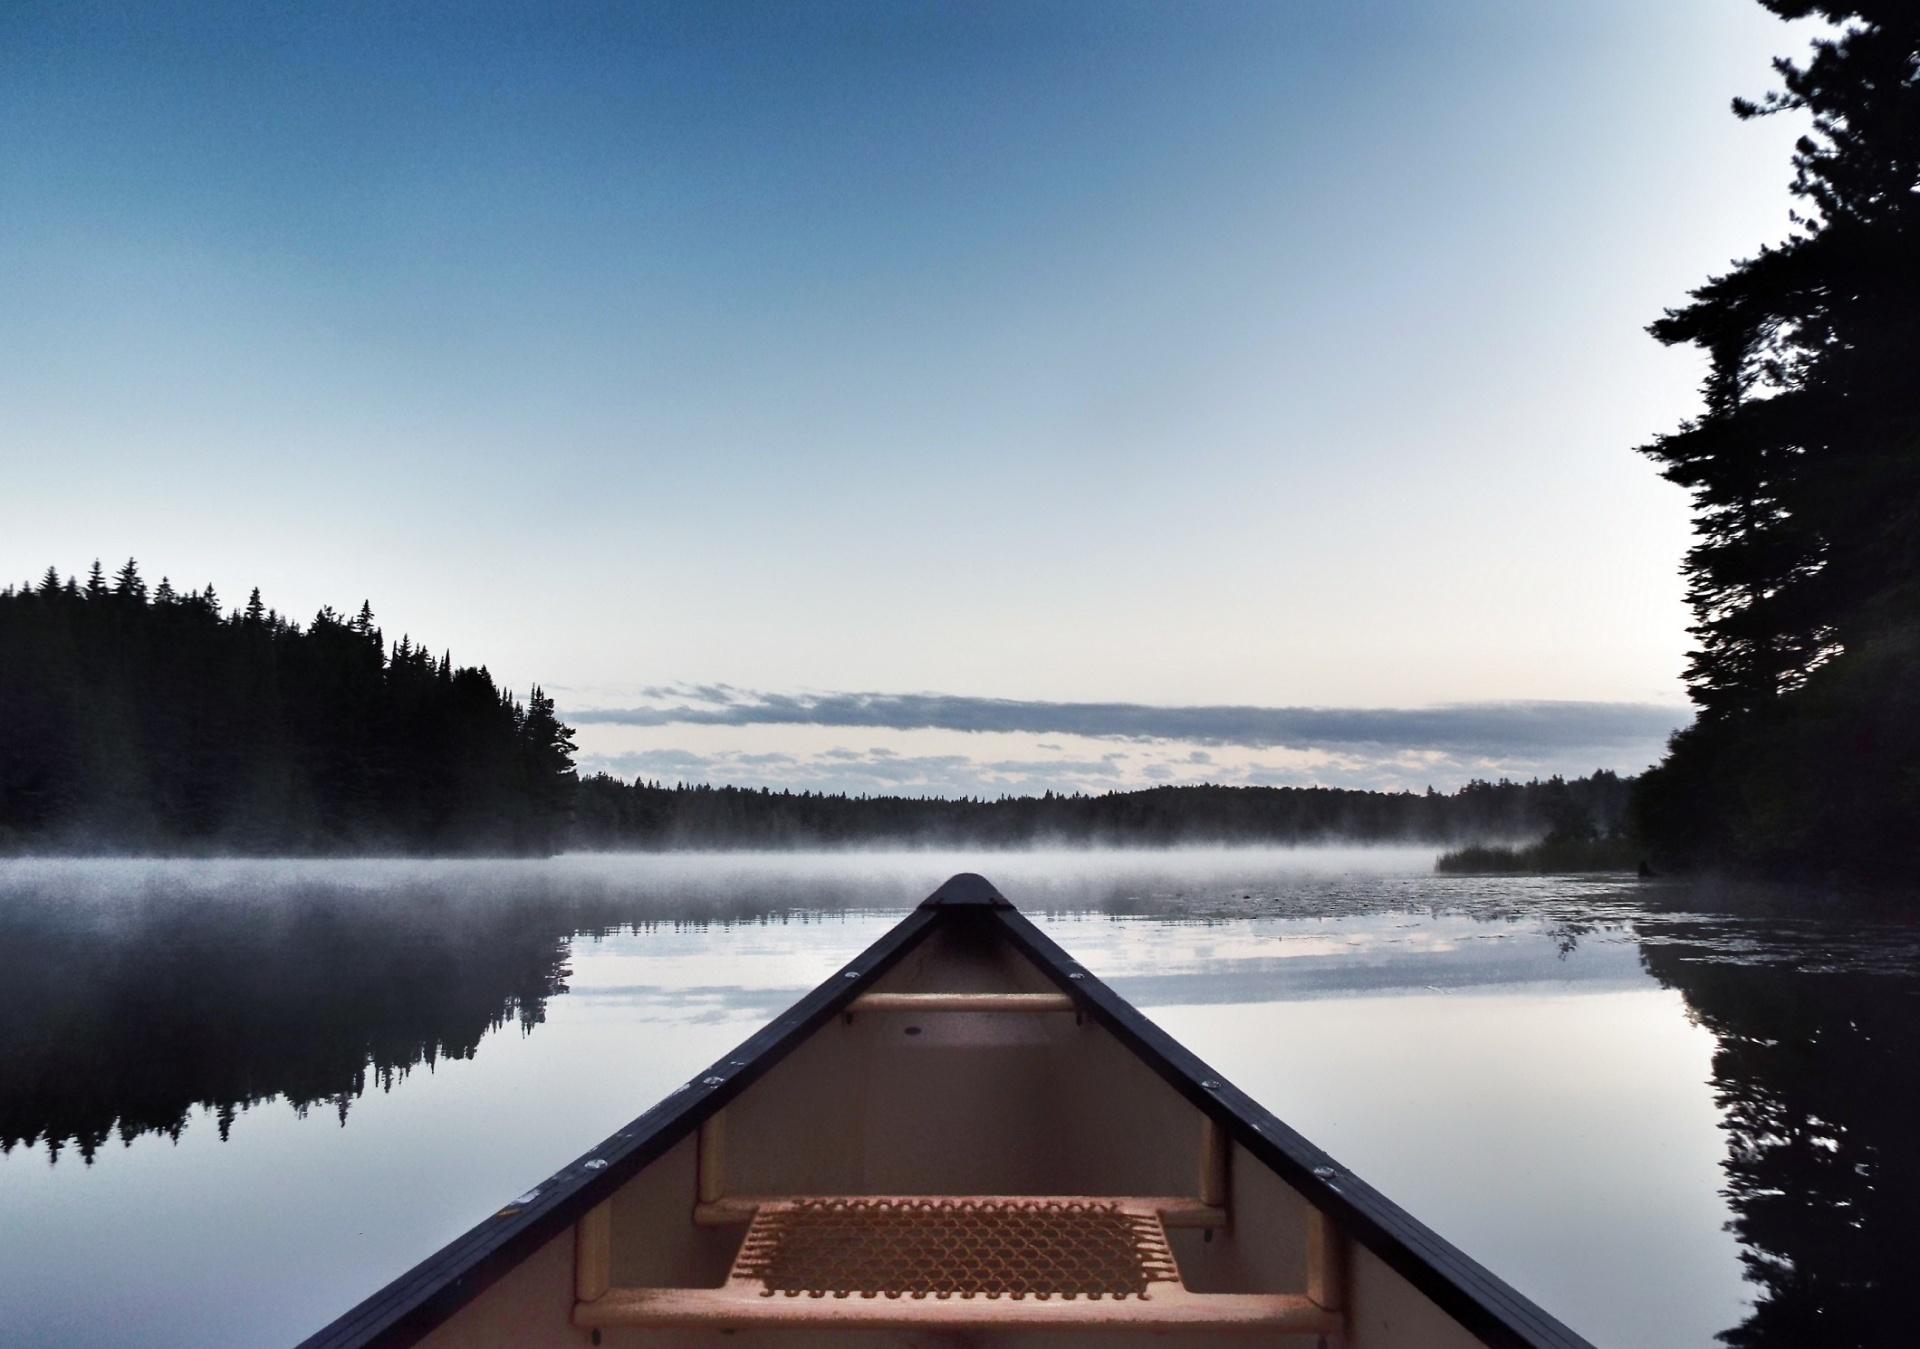 Canoe,mist,morning,landscape,water - free image from needpix.com